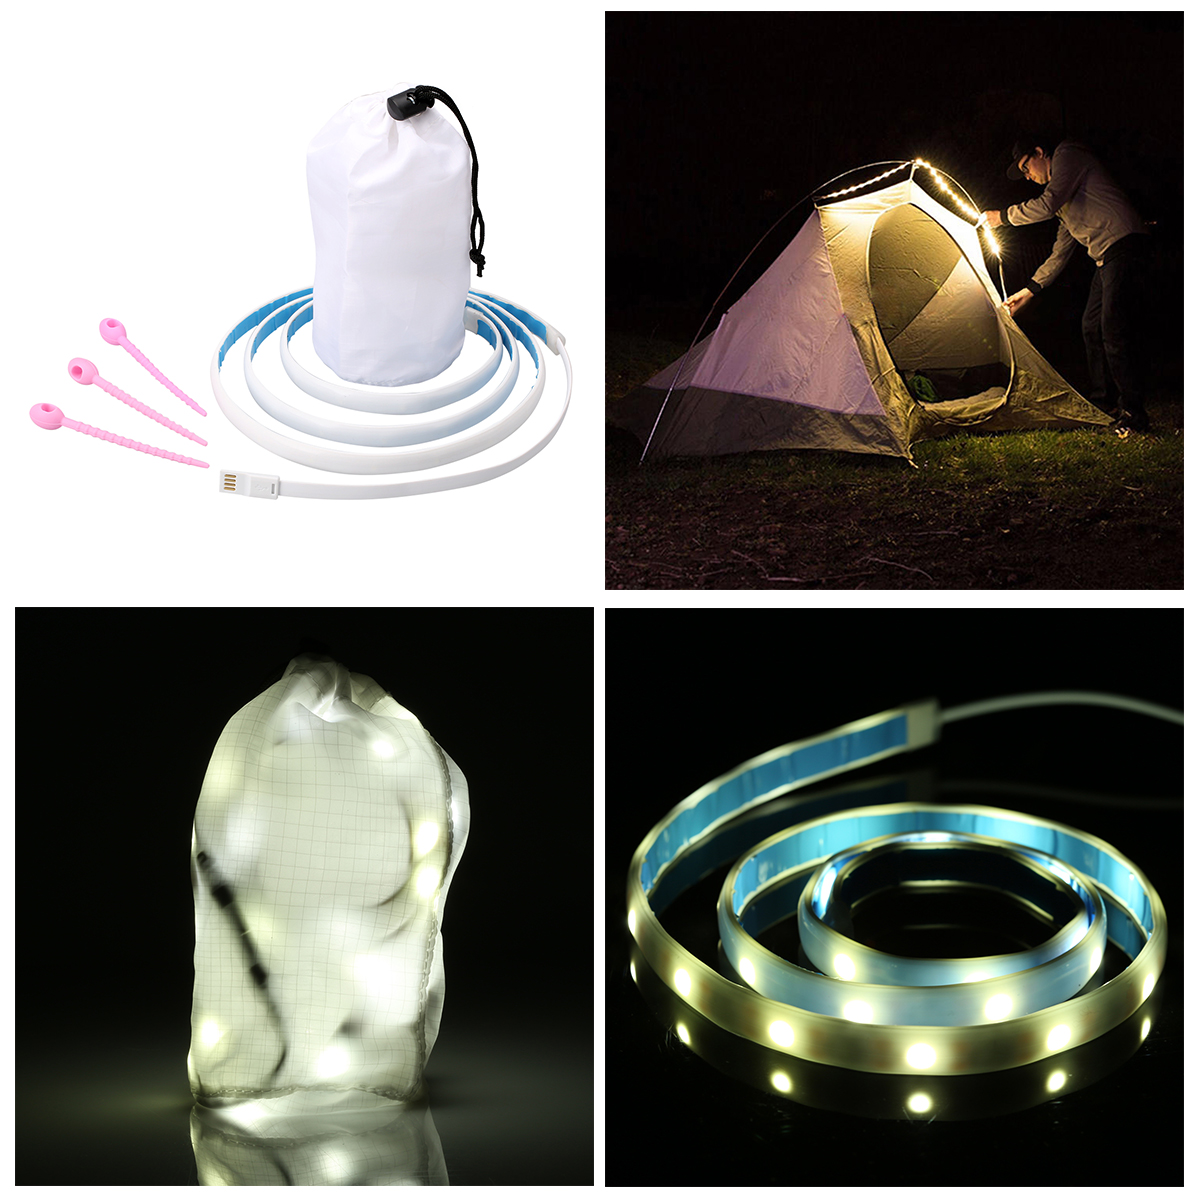 Portable Washing Machine 1m Decoration String Light for washing machine